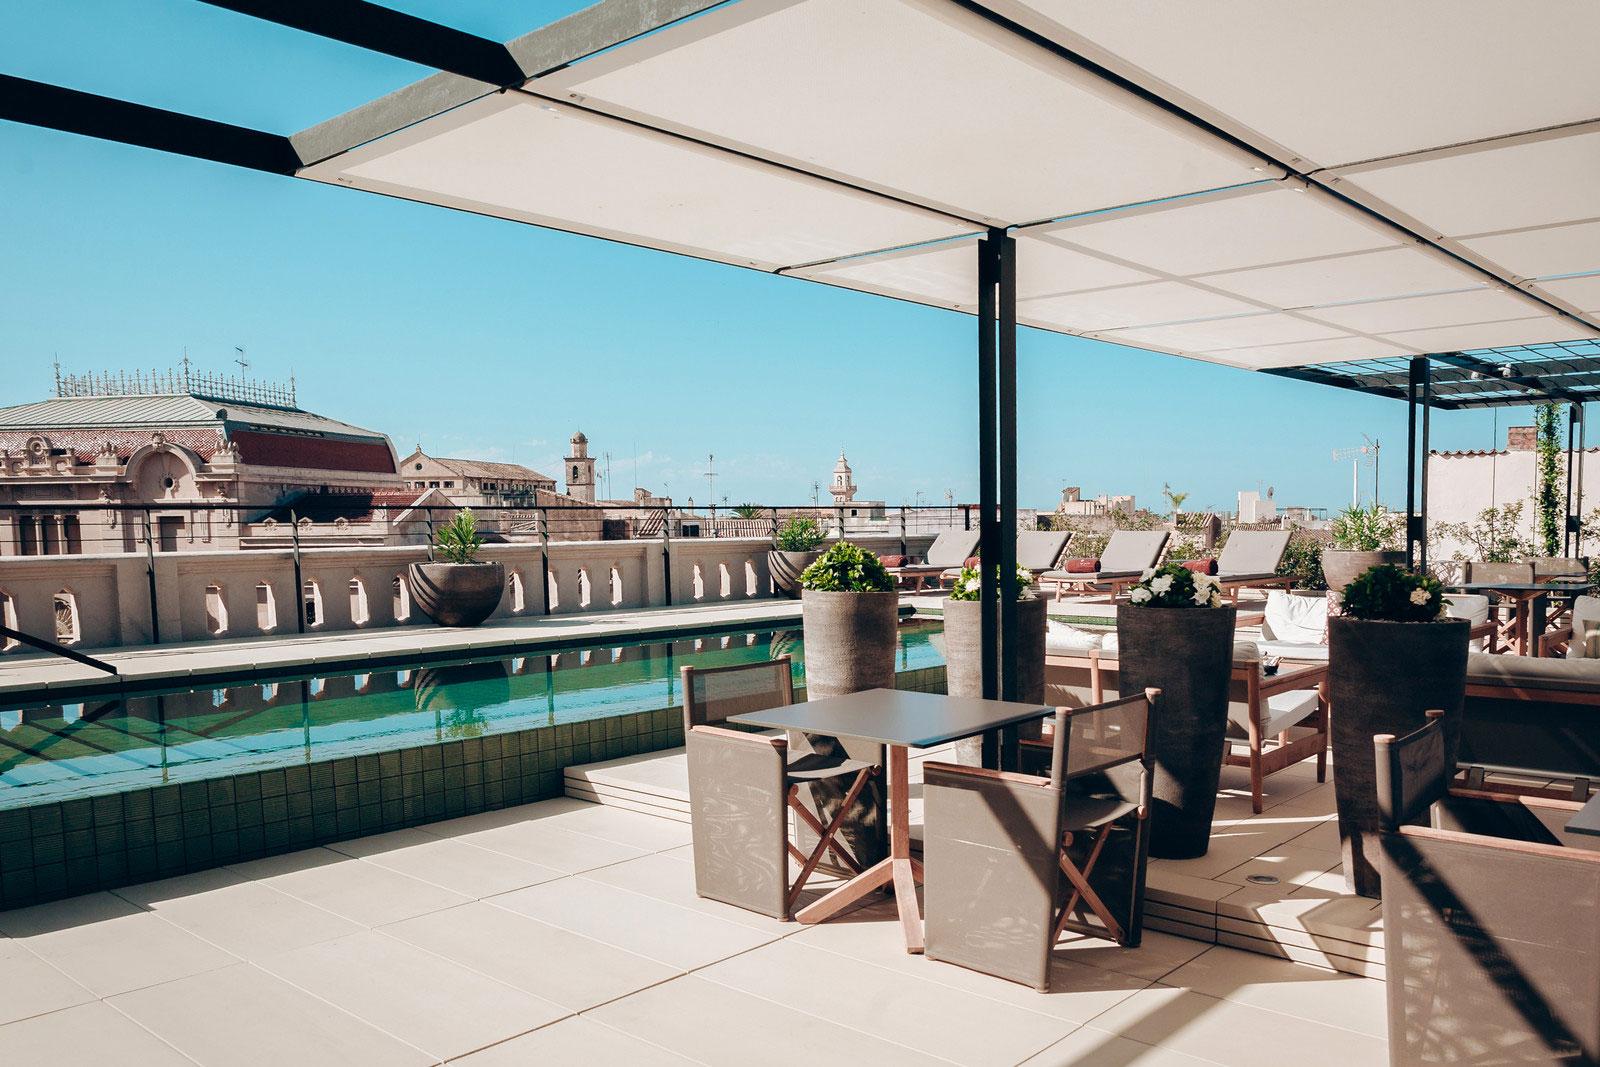 San francesc hotel in palma de mallorca caandesign for Top design hotels mallorca